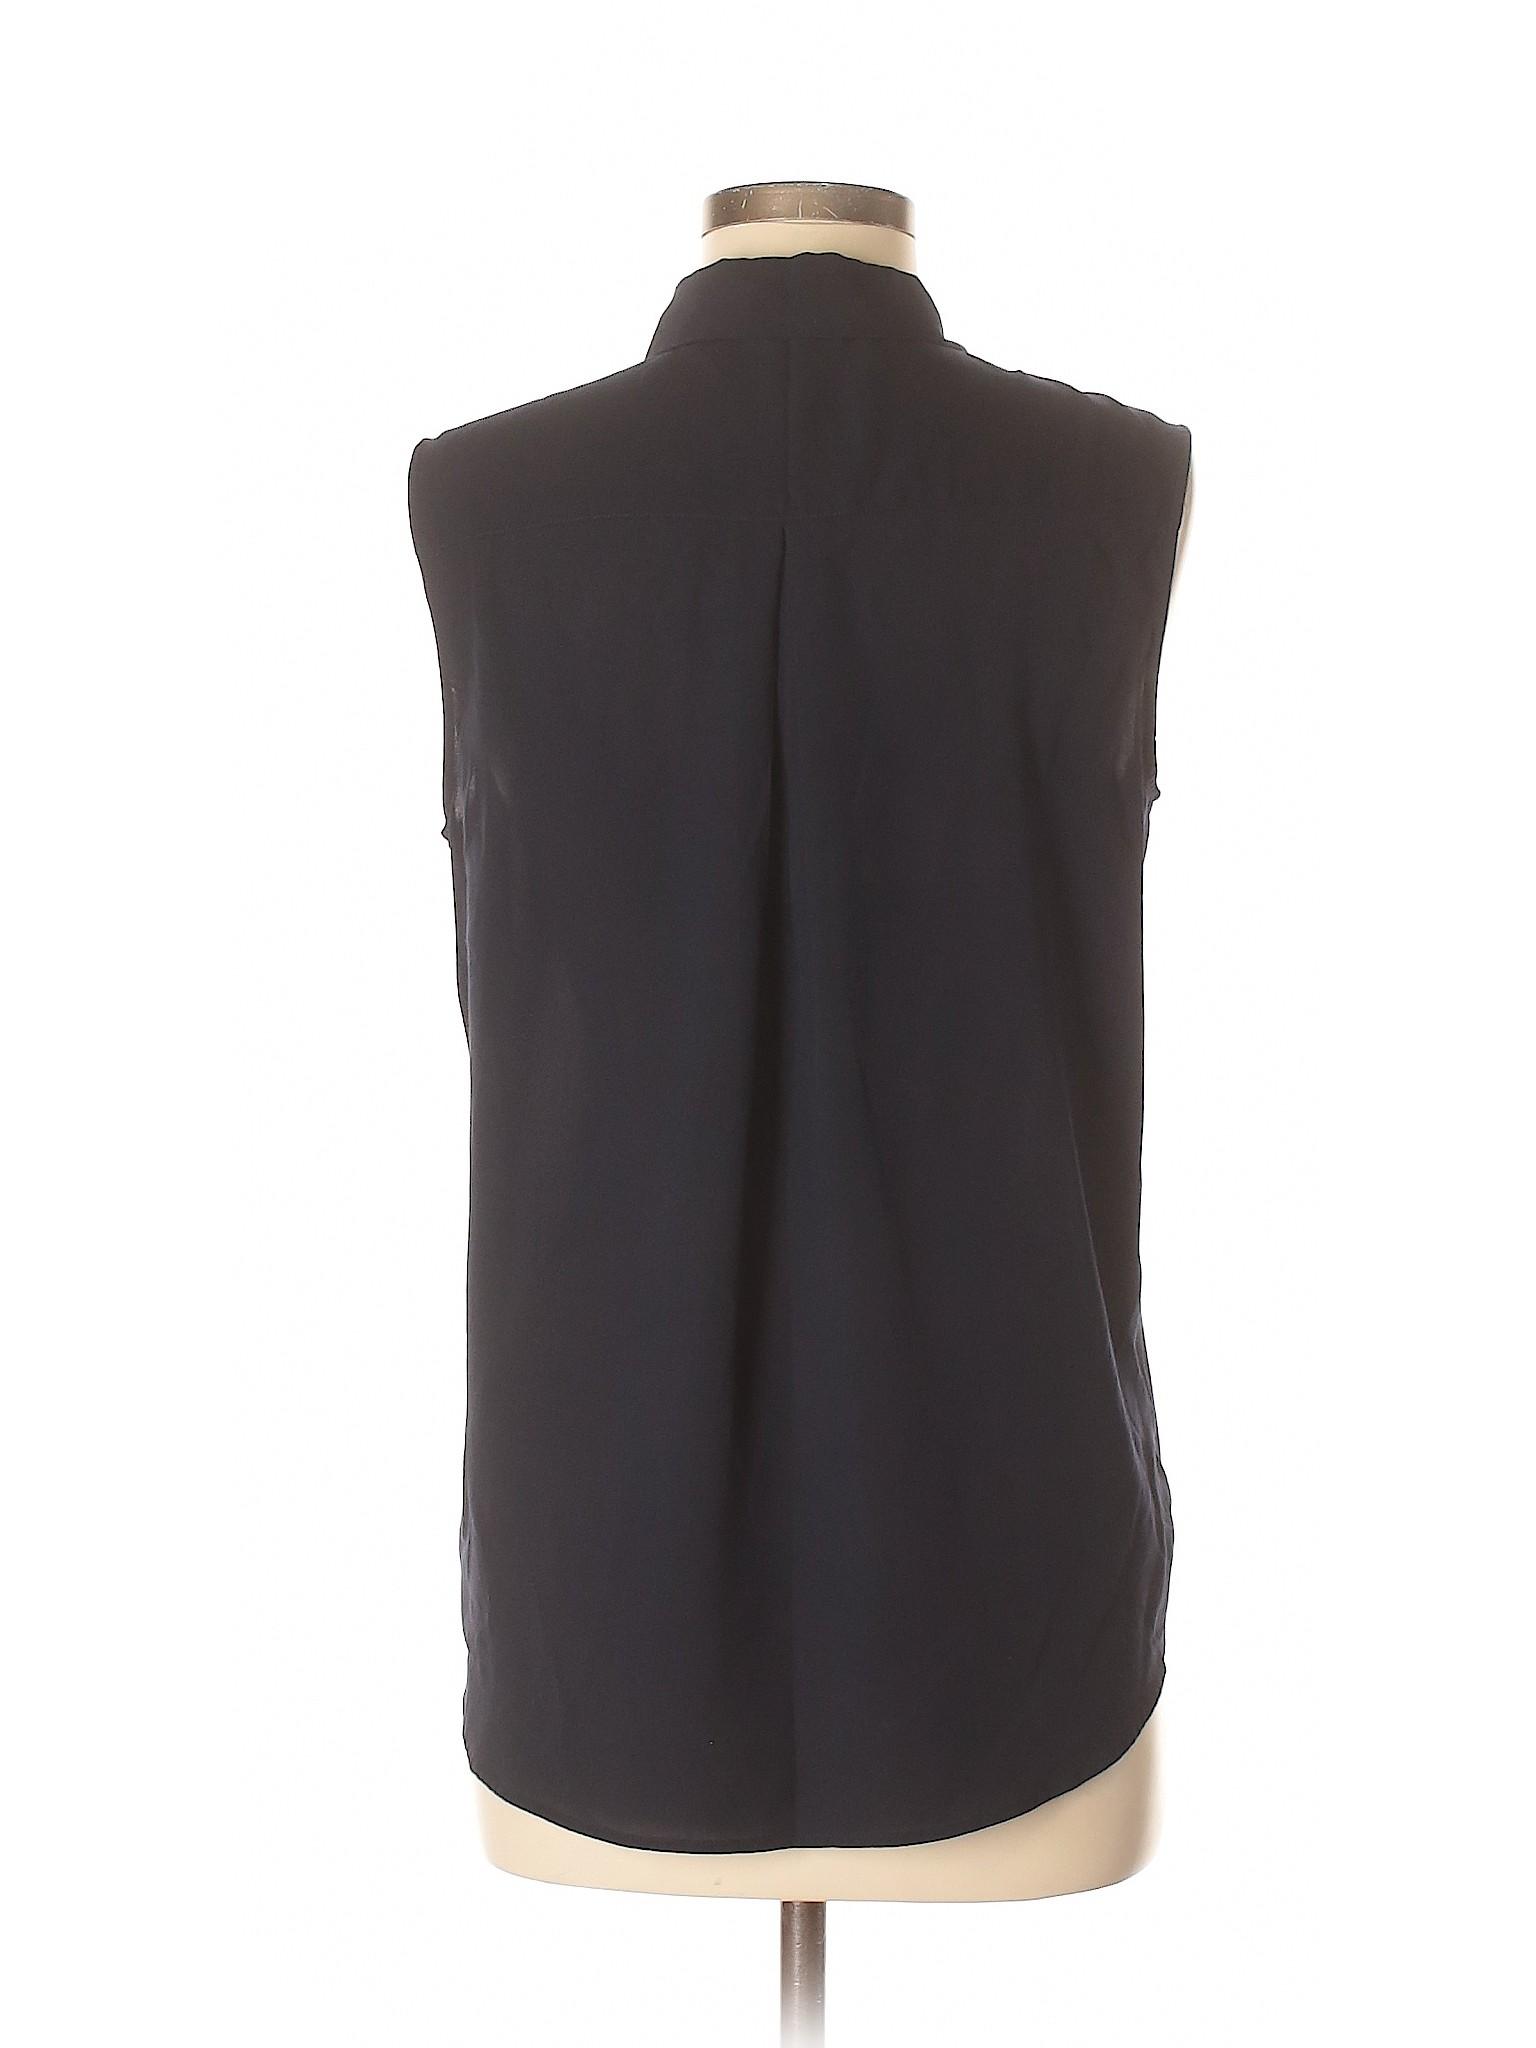 6492a6221f7b64 Uniqlo Solid Dark Blue Sleeveless Blouse Size M - 66% off